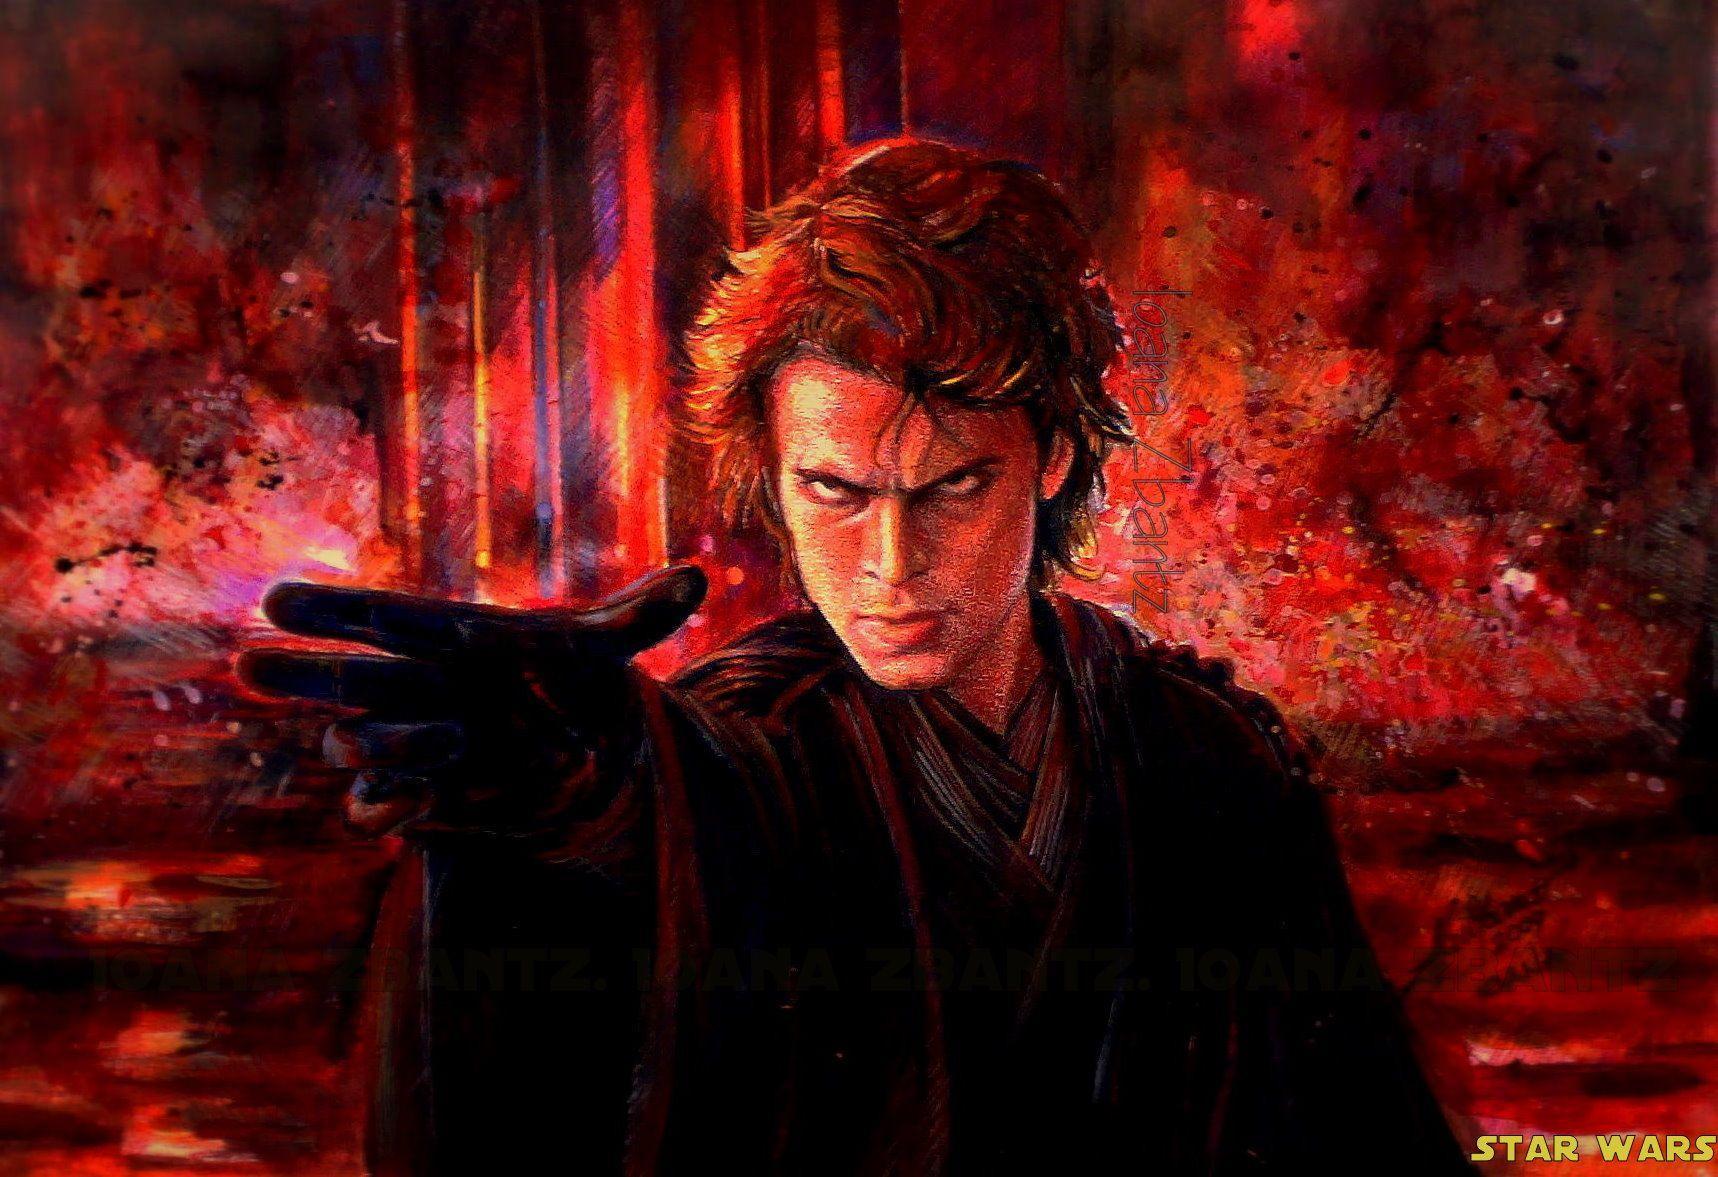 Anakin Skywalker Wallpapers Top Free Anakin Skywalker